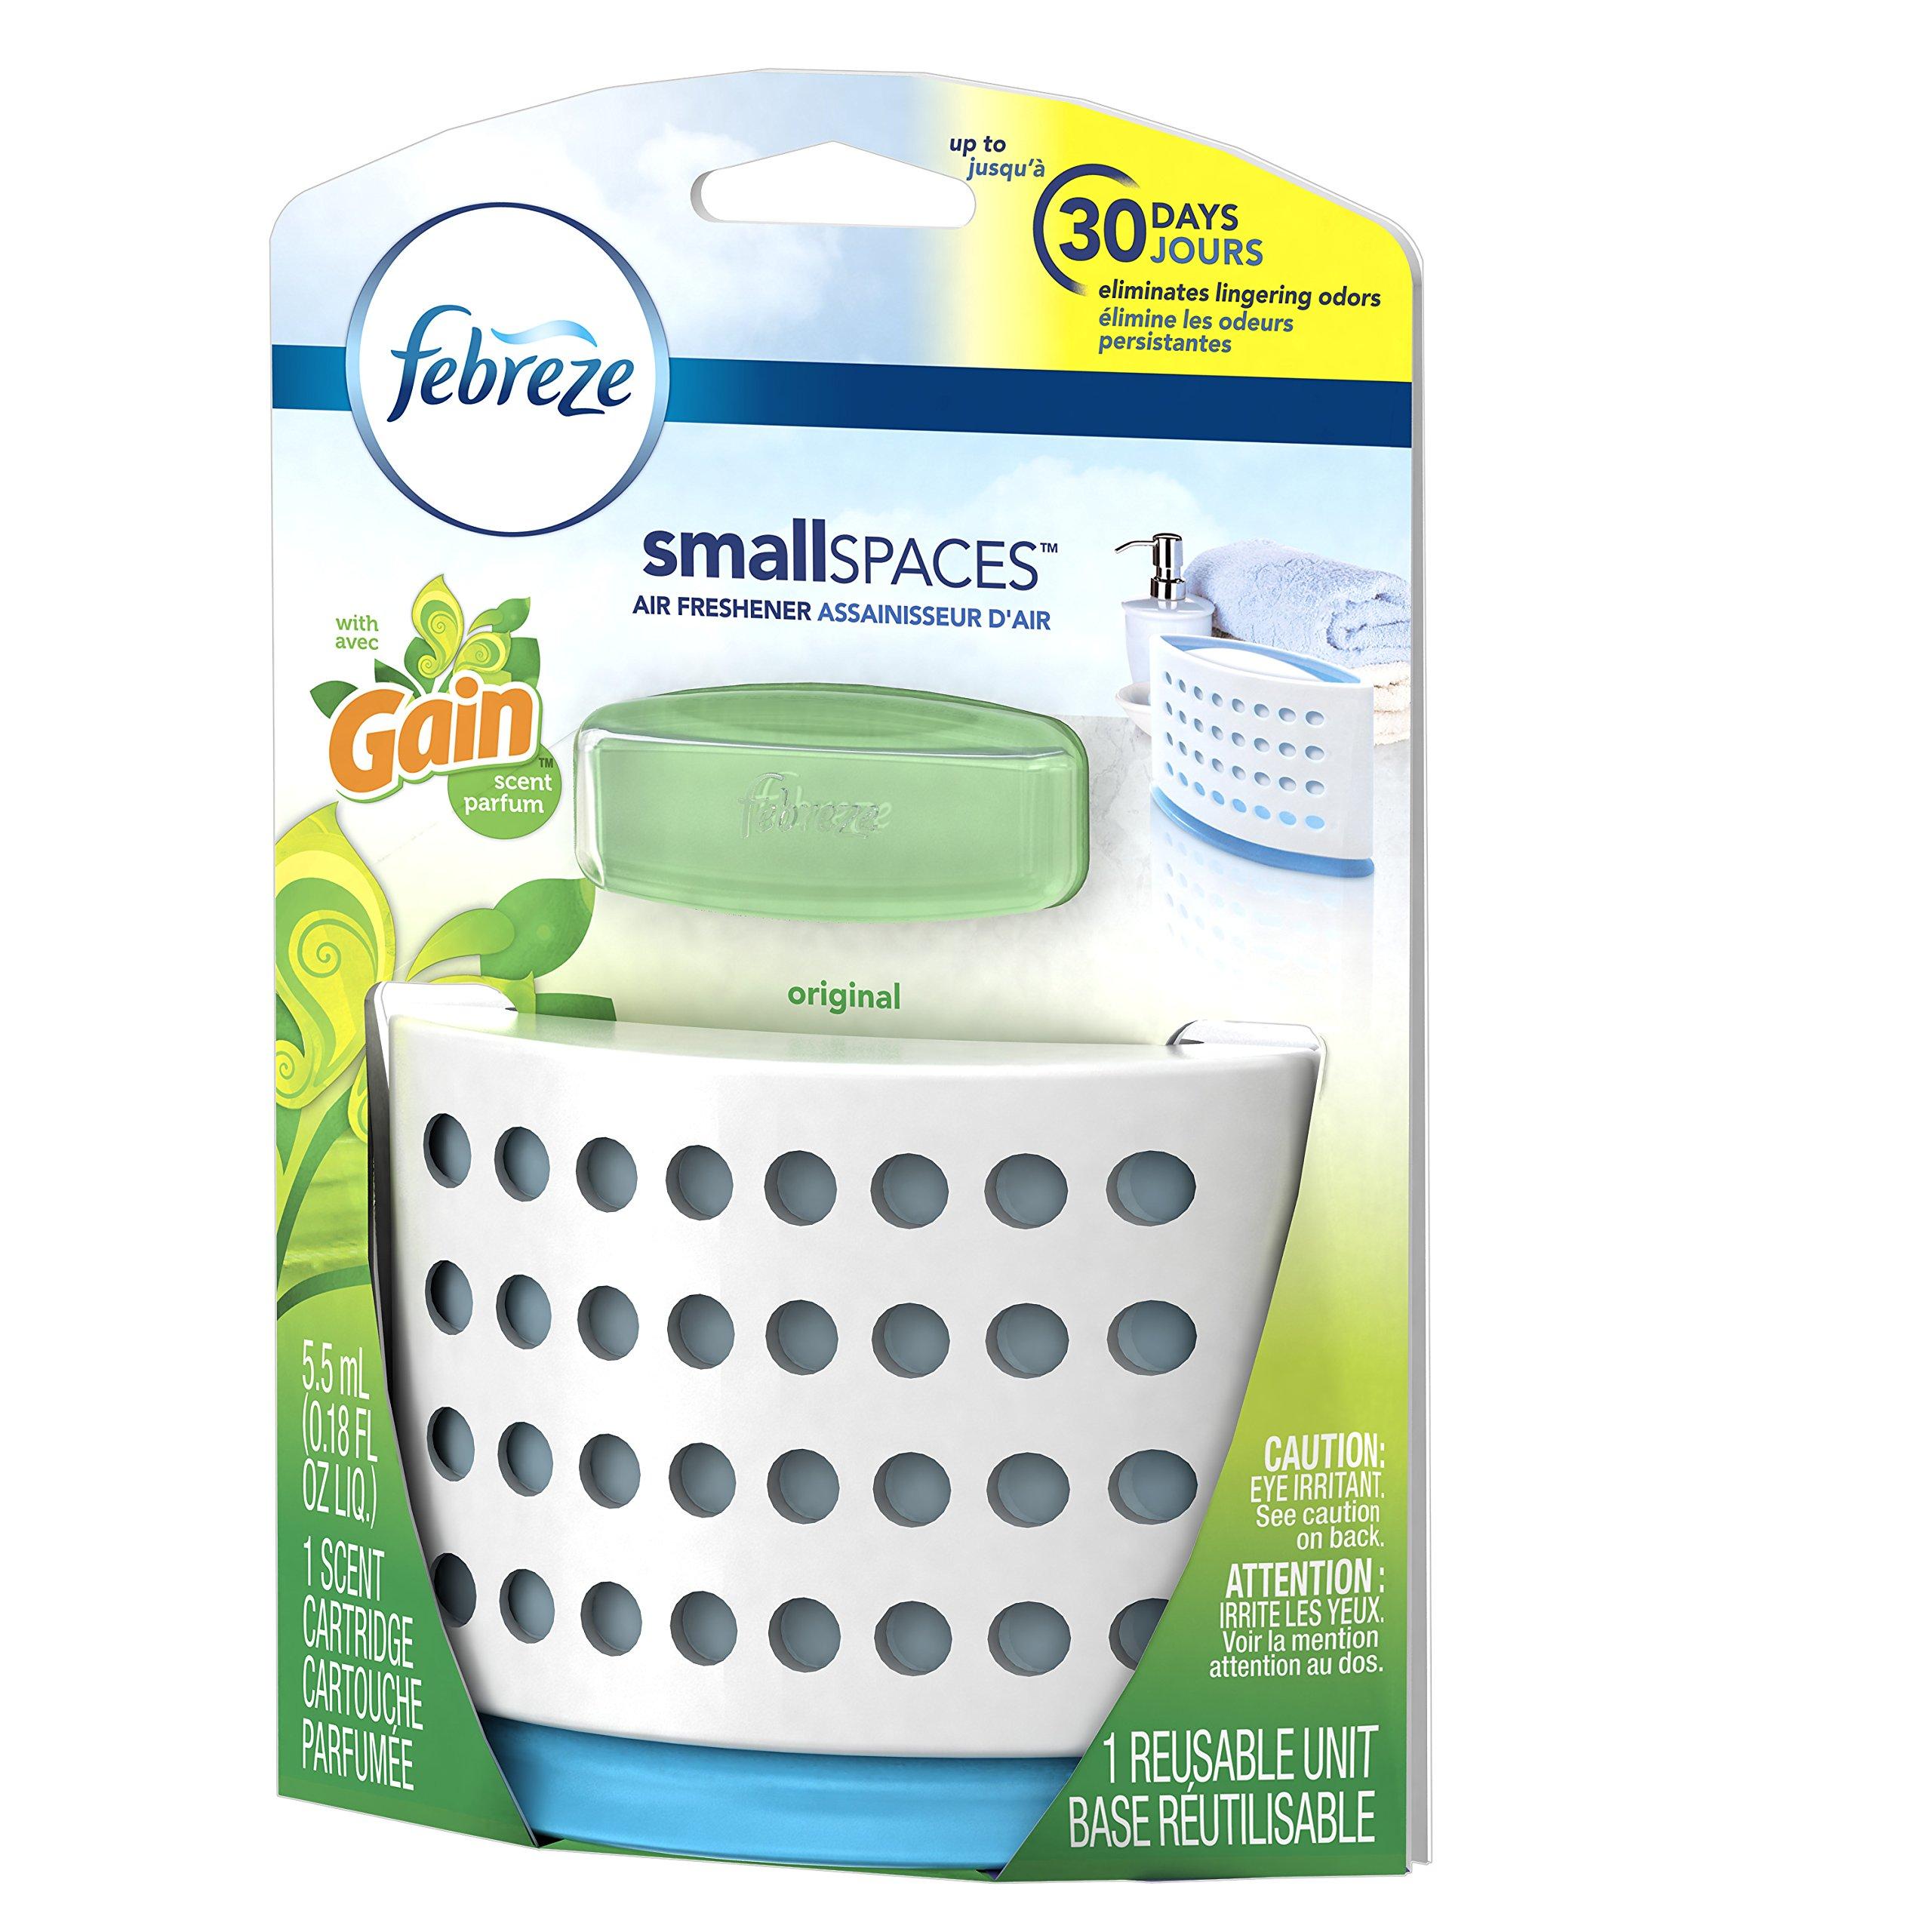 Febreze Air Freshener,  Small Spaces Air Freshener,  with Gain Original Starter Kit Air Freshener 5.5 mL(Pack of 8) by Febreze (Image #4)